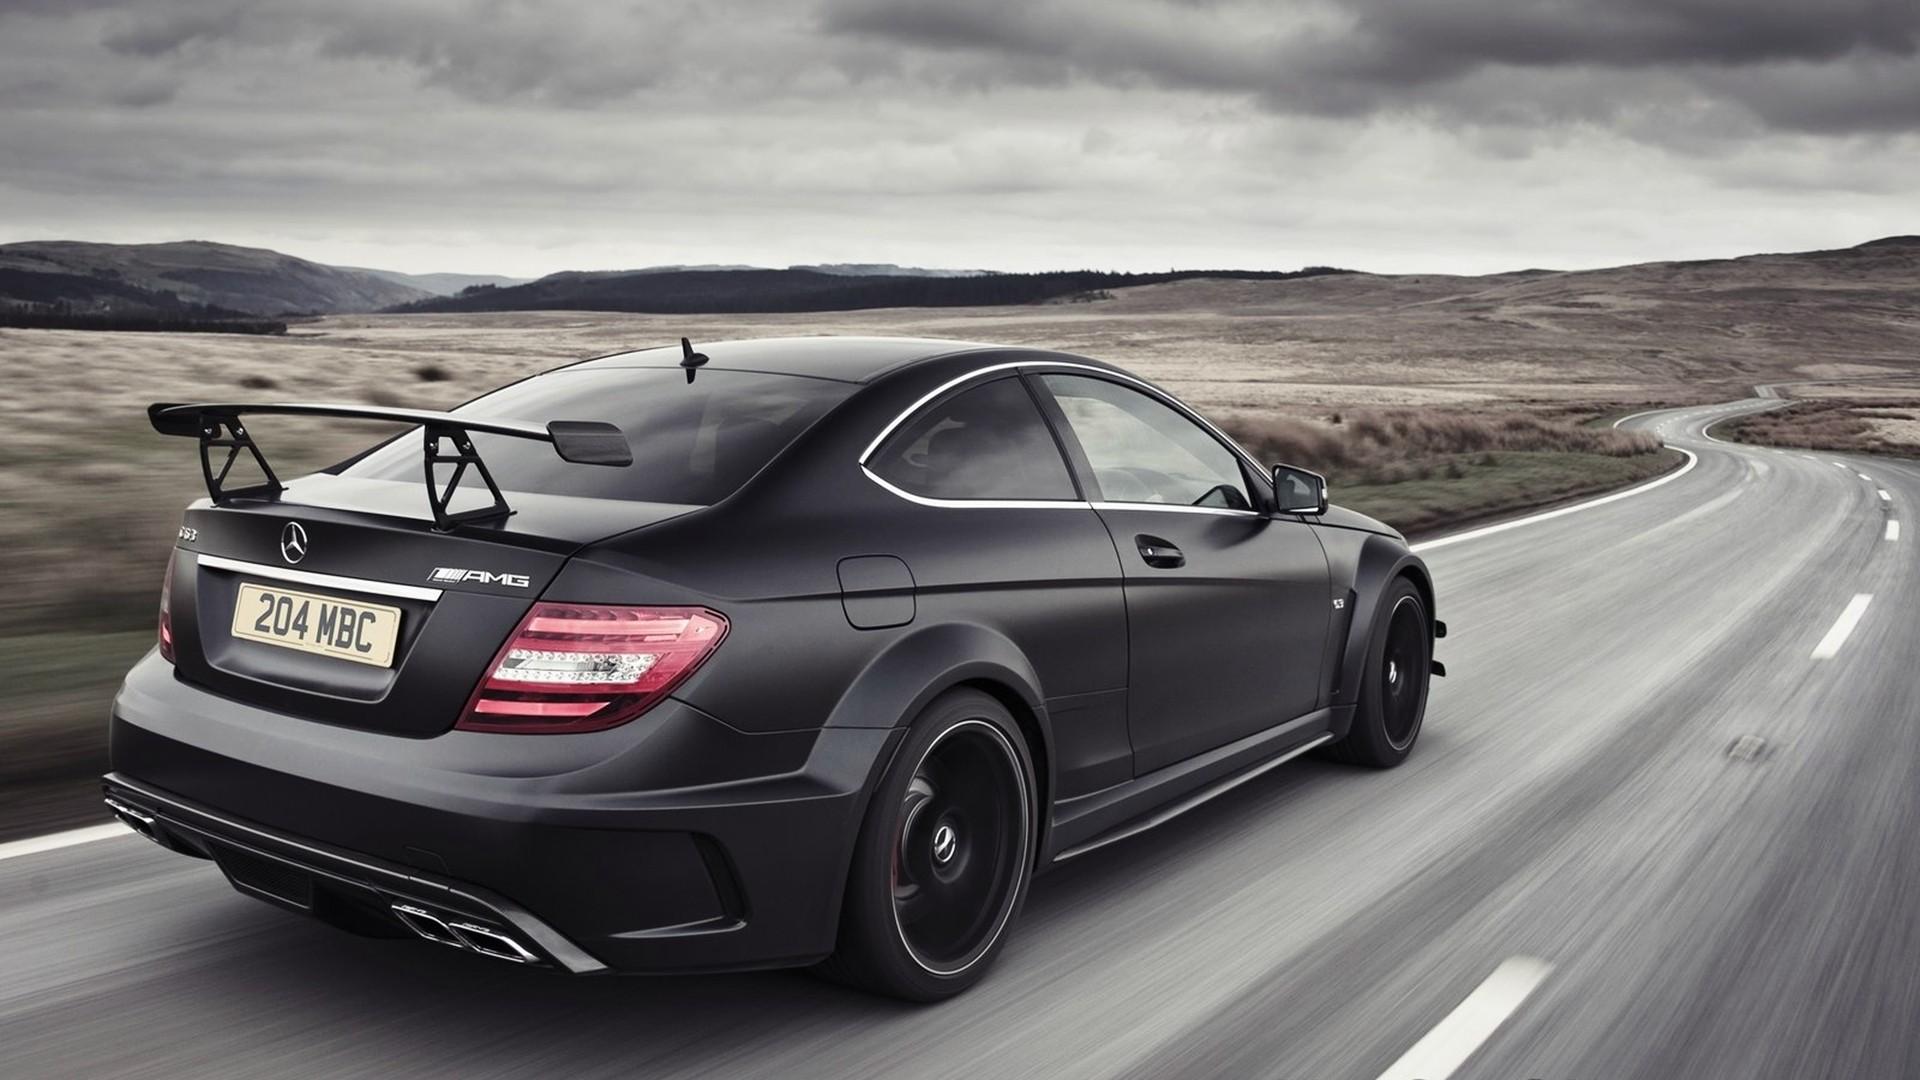 automotive royal respect - photo #9